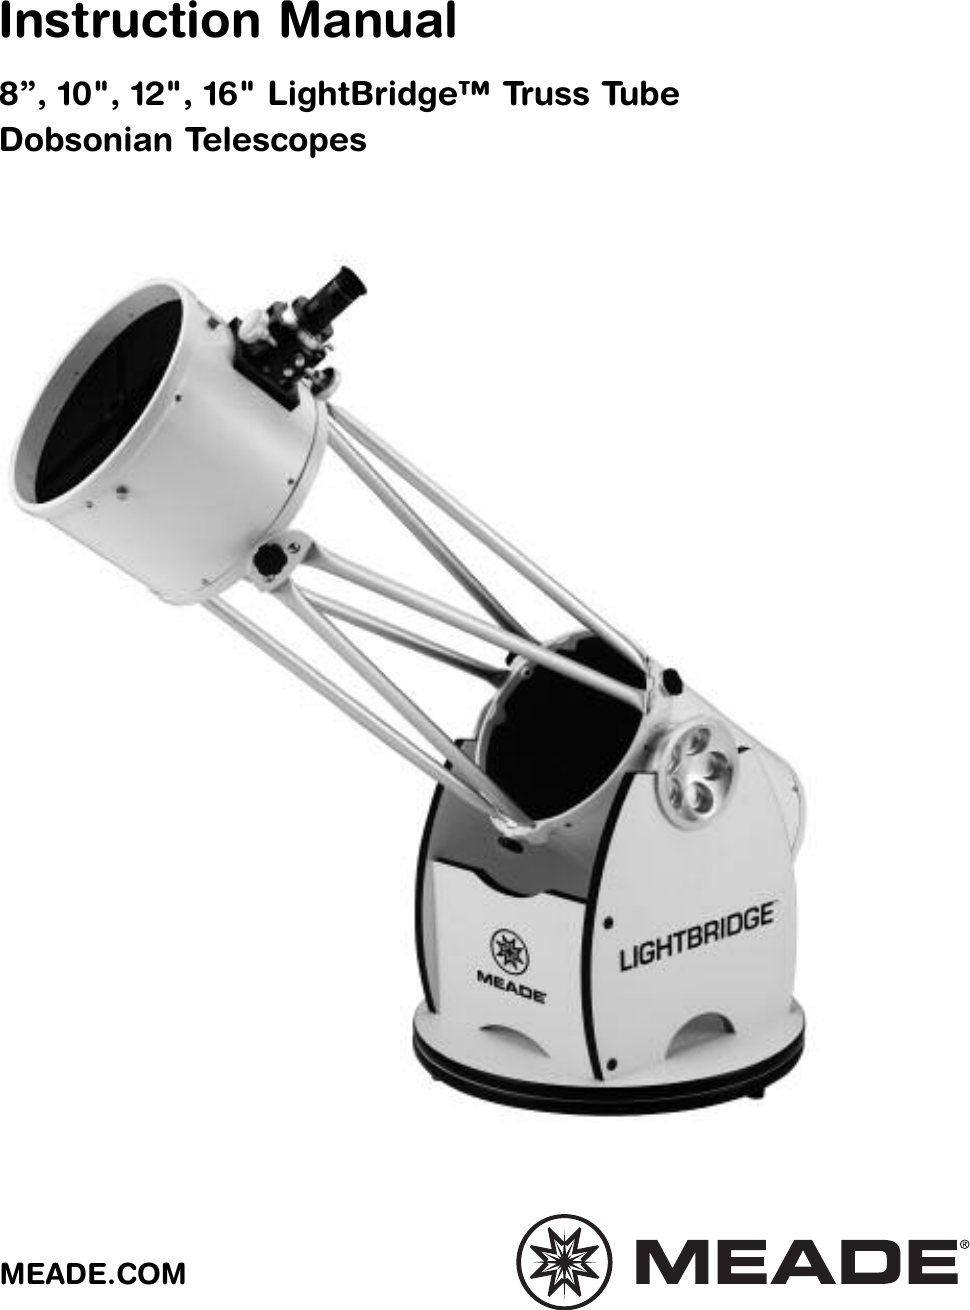 Old Meade Telescopes